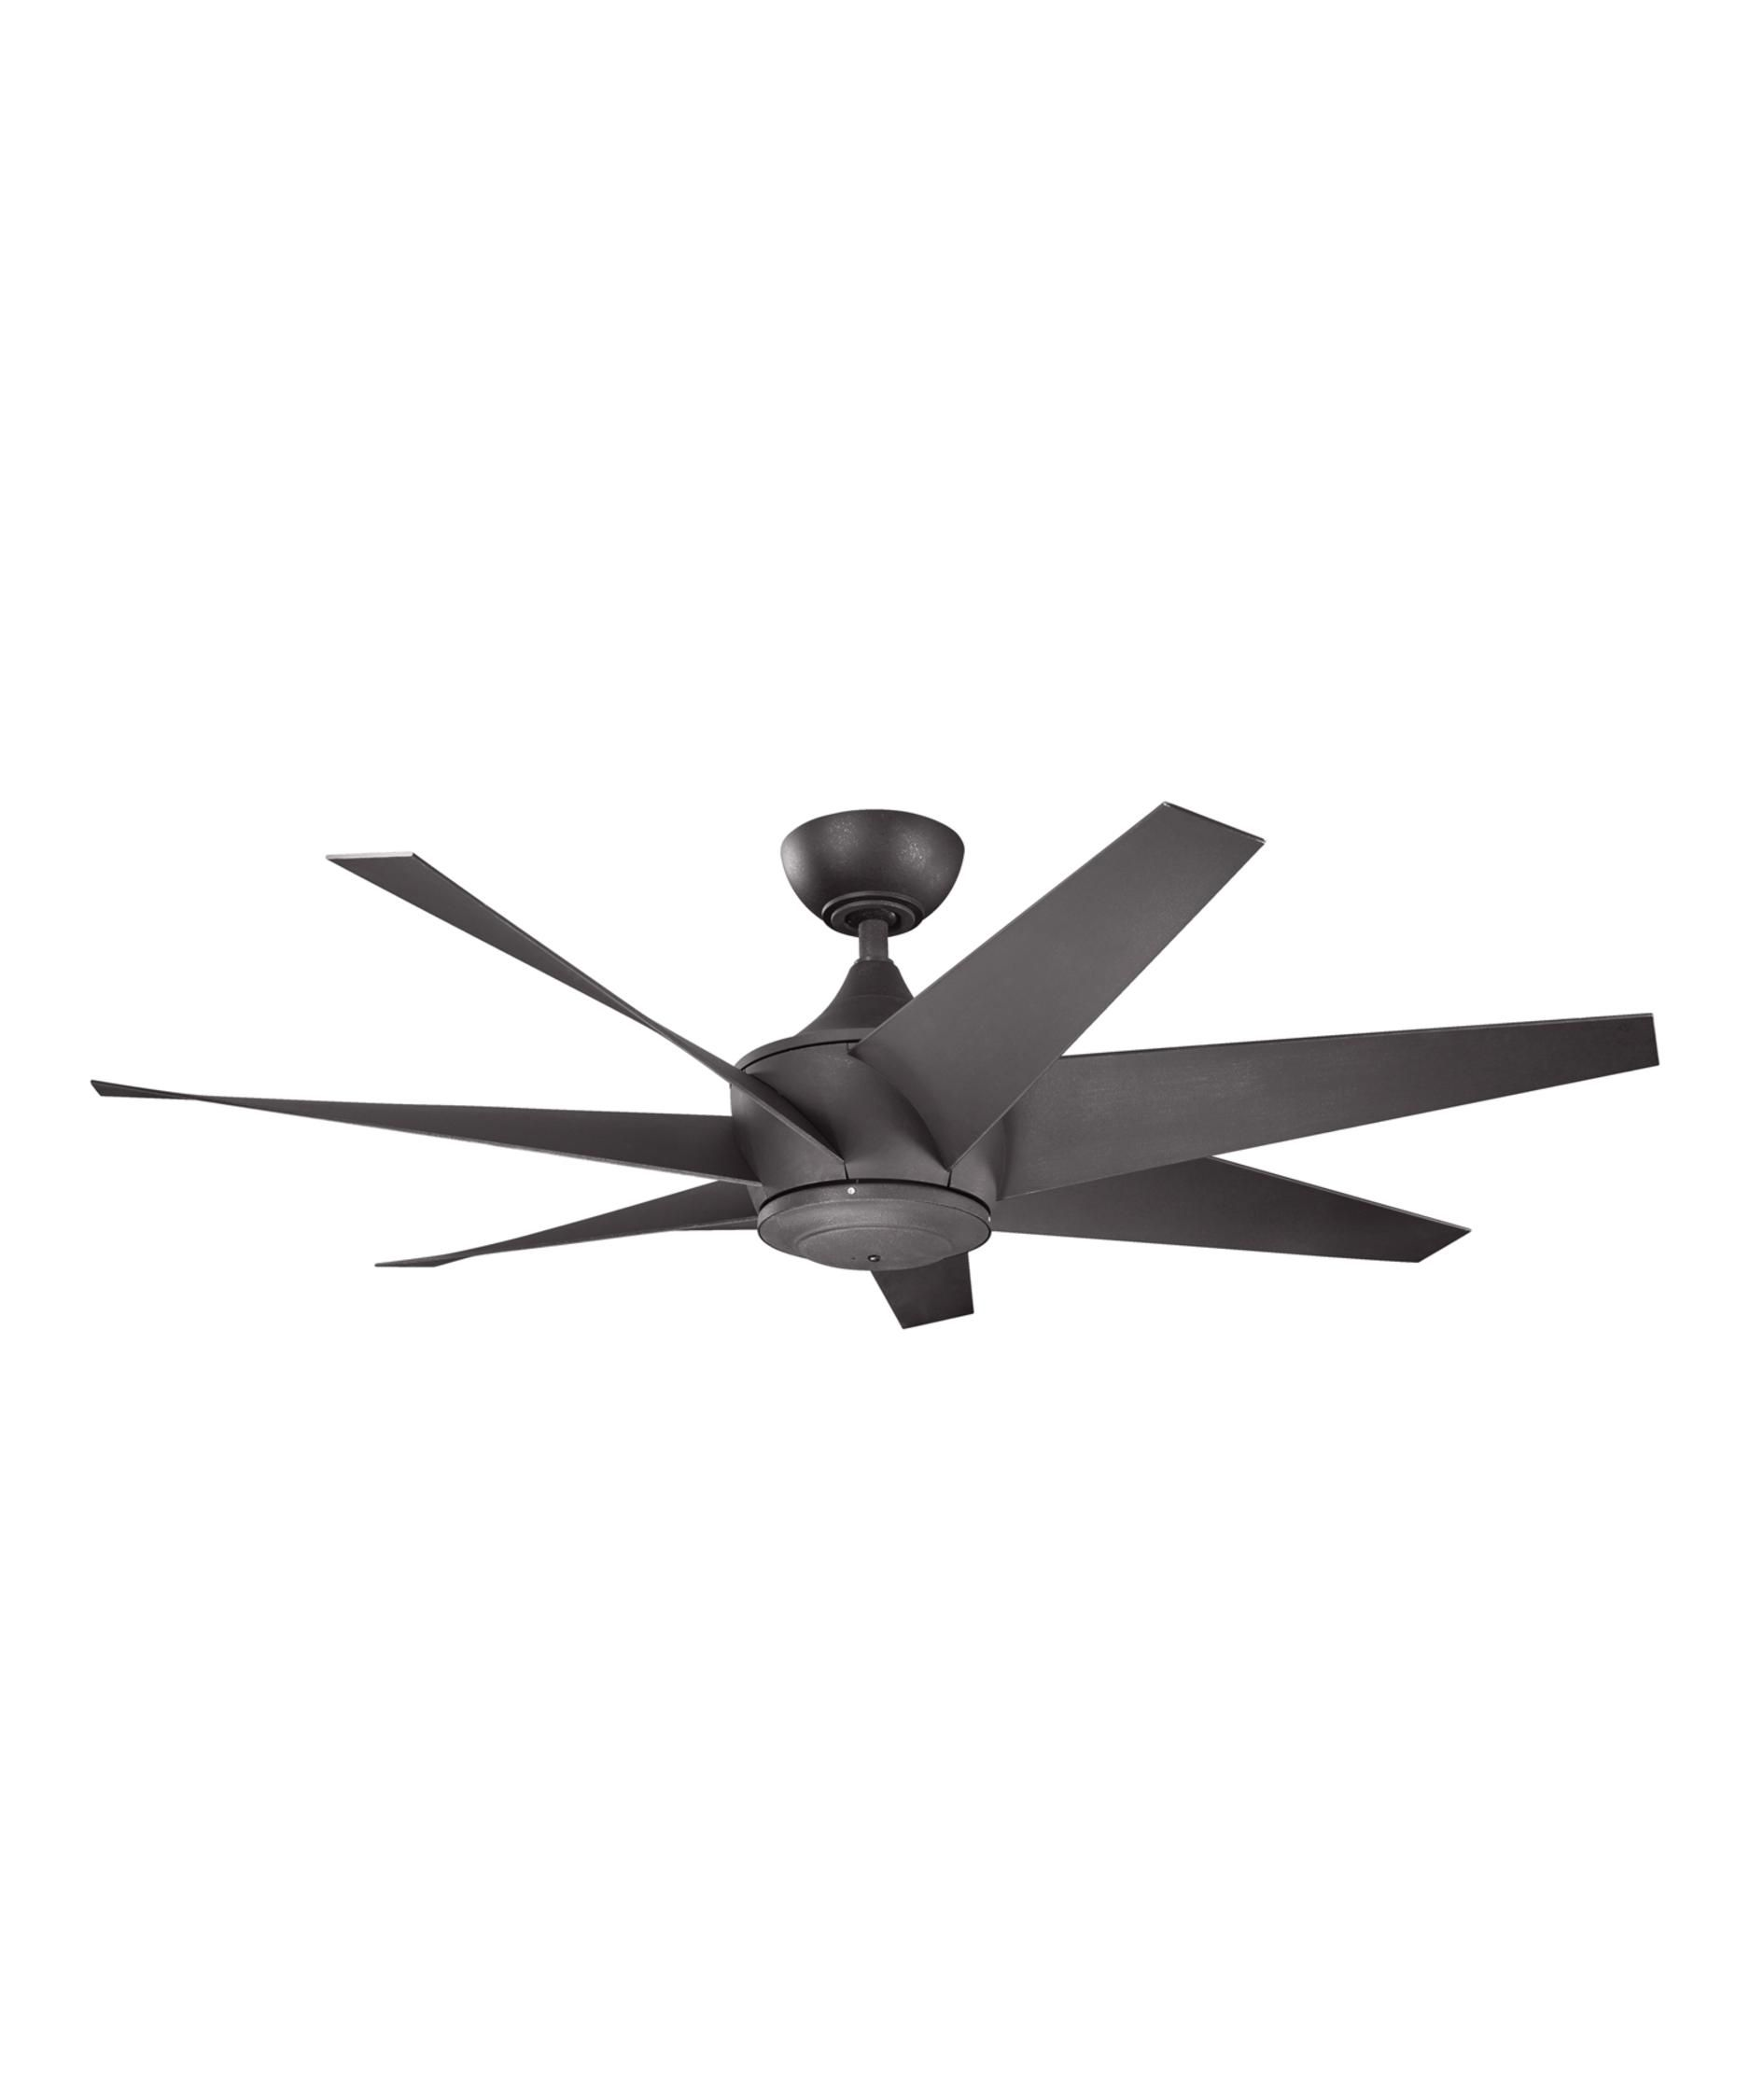 Kichler Lehr II 54 Inch 7 Blade Ceiling Fan